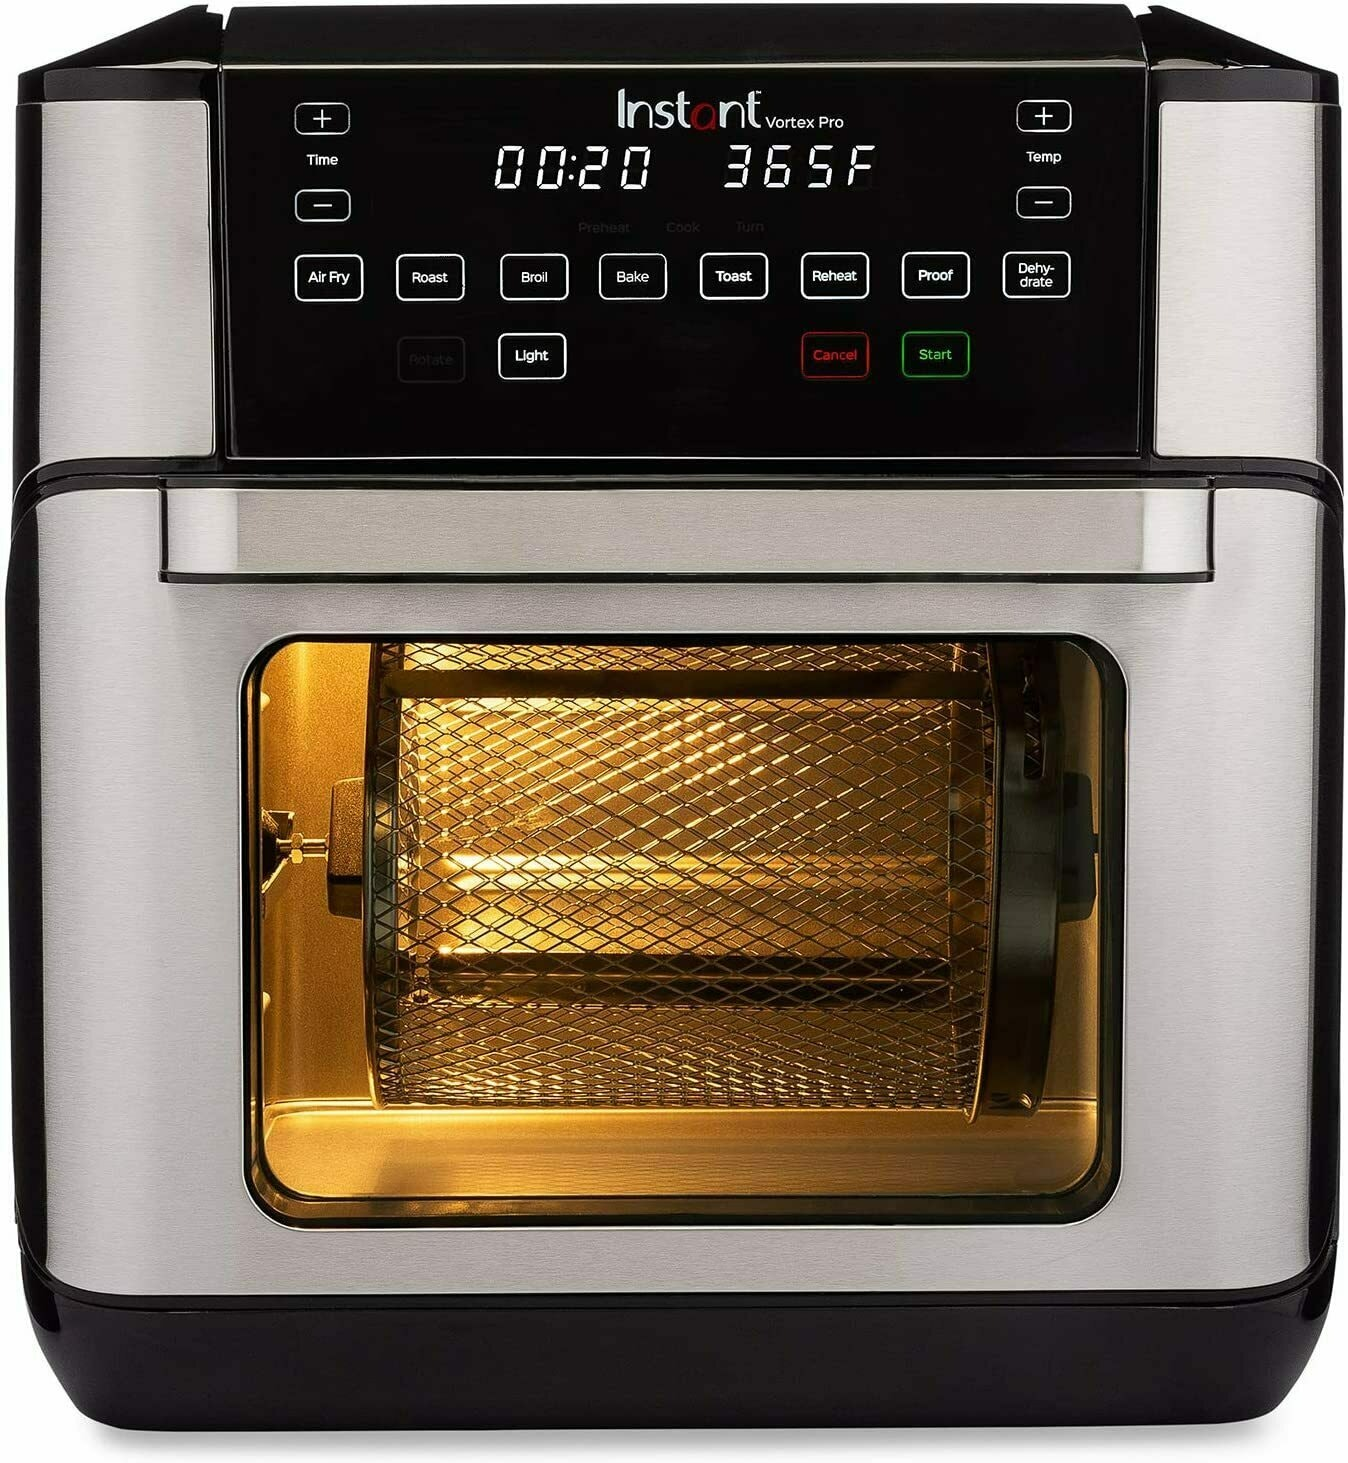 Instant Vortex Pro Air Fryer Oven